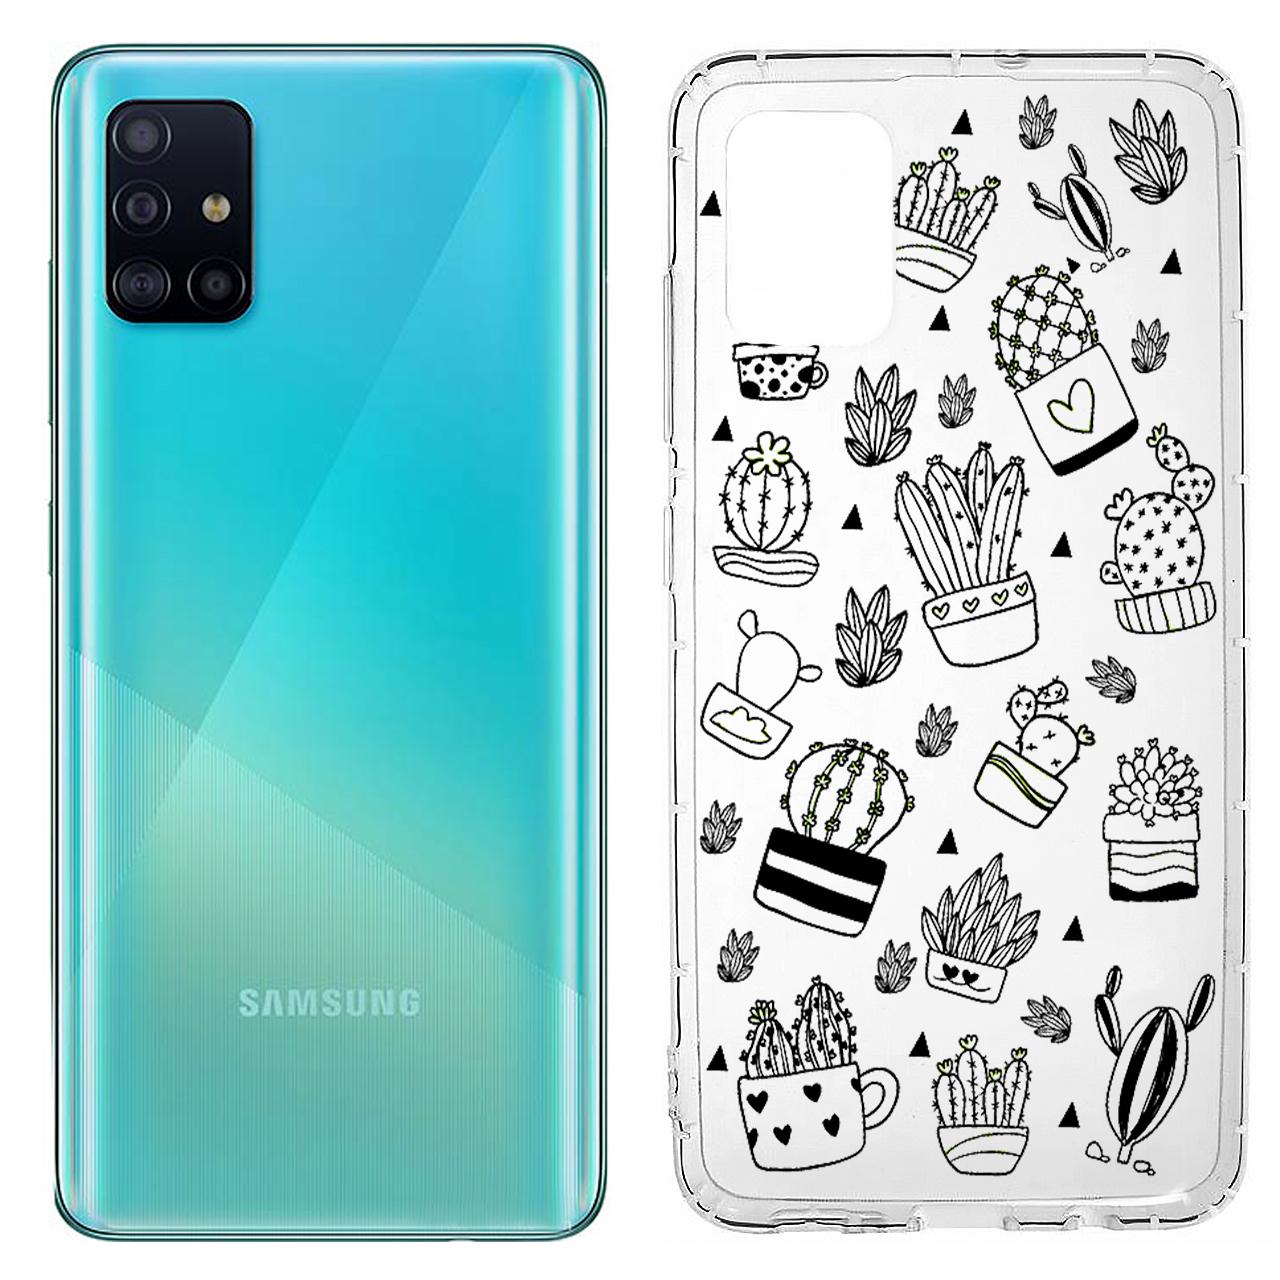 کاور کی اچ کد C20 - B مناسب برای گوشی موبایل سامسونگ Galaxy A51